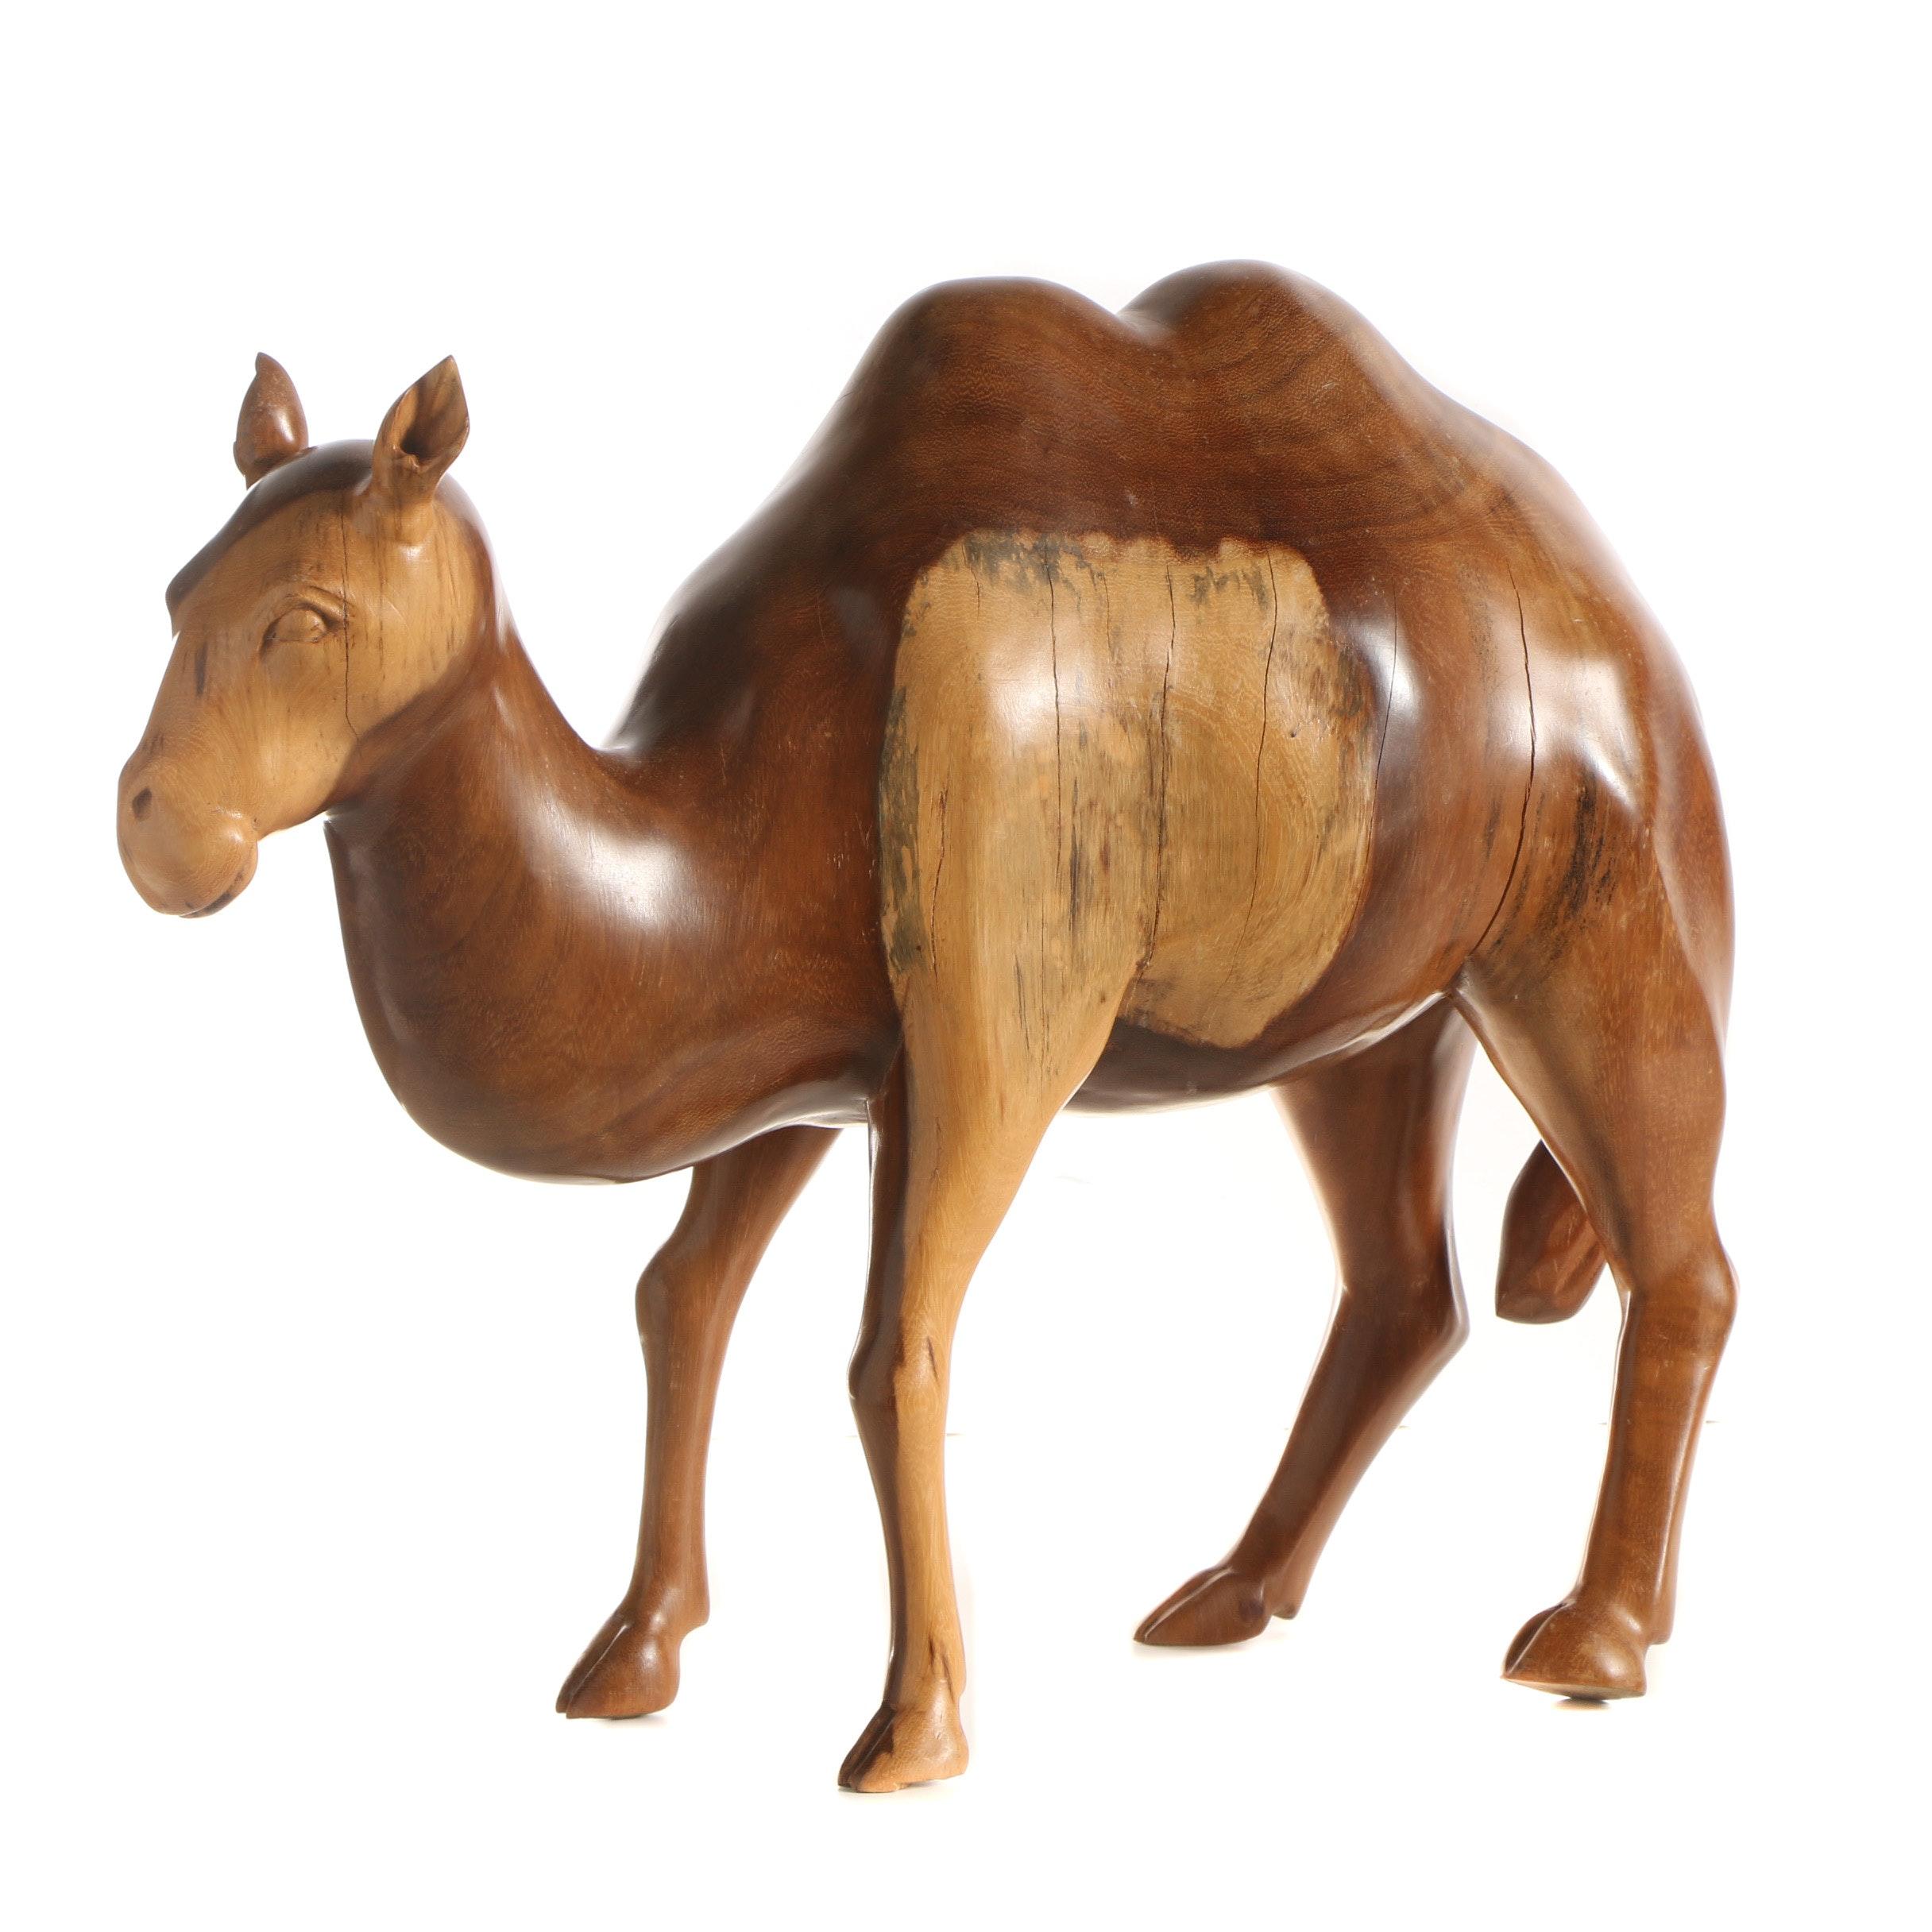 Carved Wooden Sculpture of a Camel